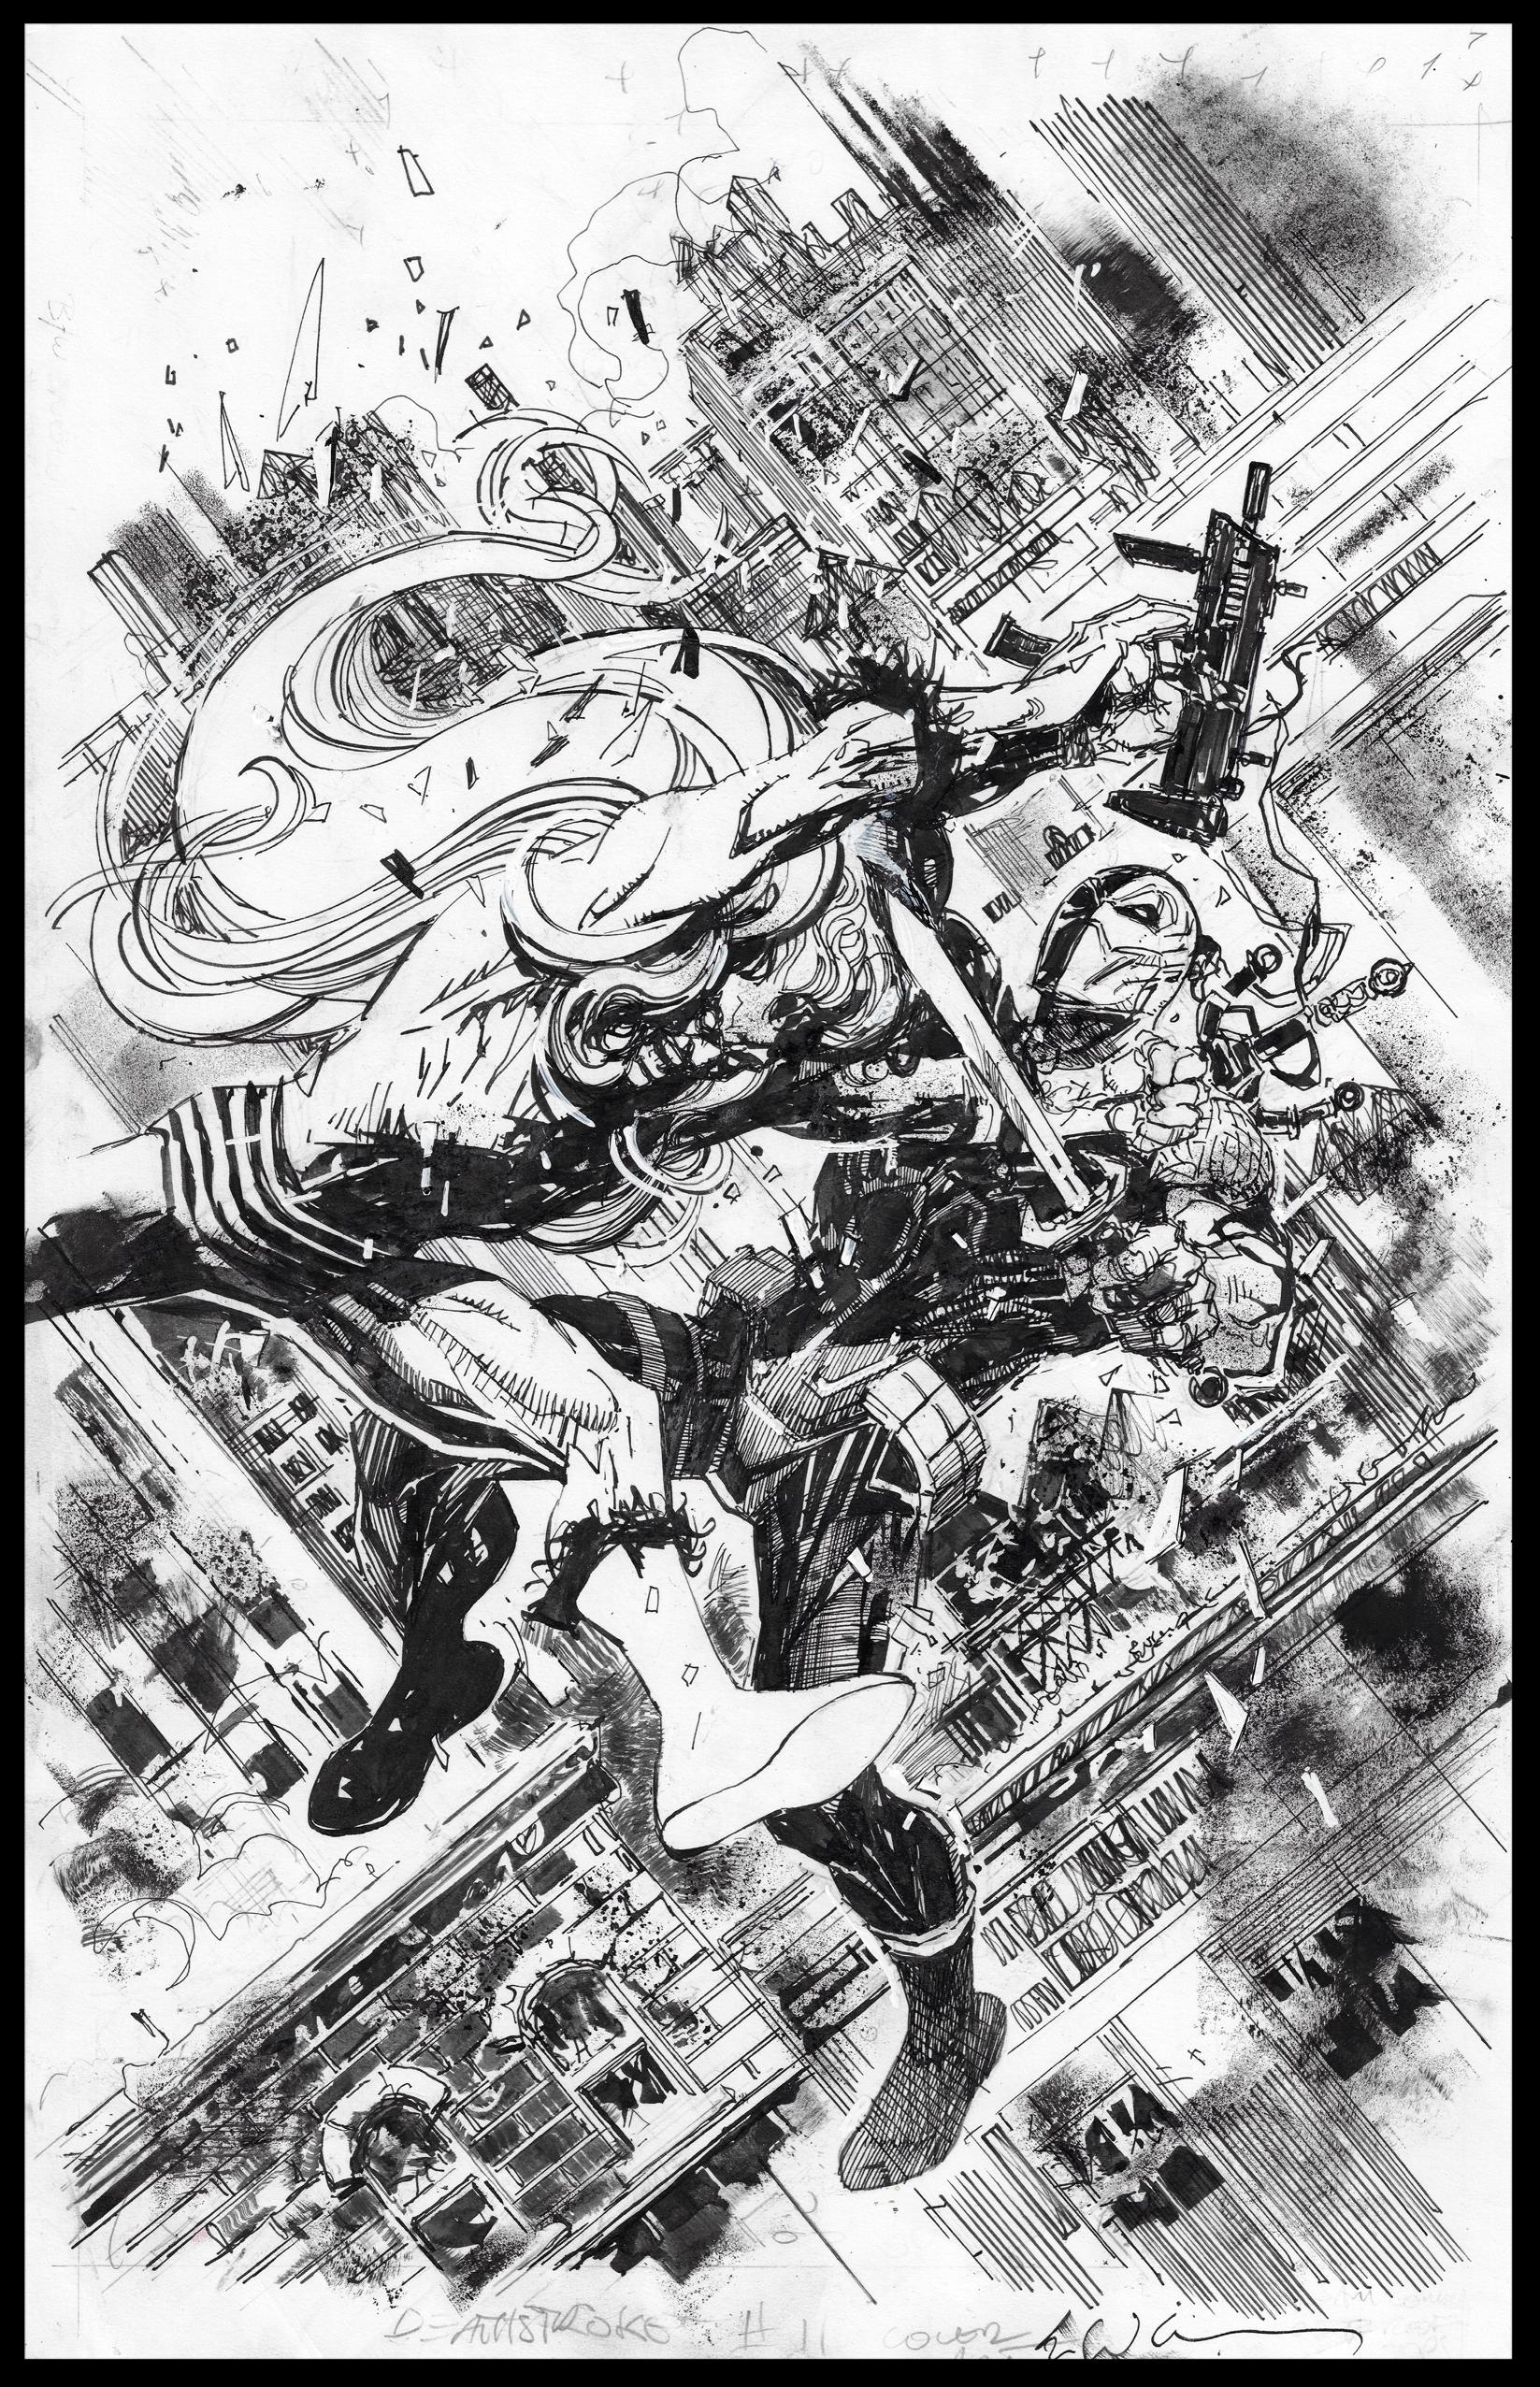 Deathstroke #11 - Cover - Pencils & Inks